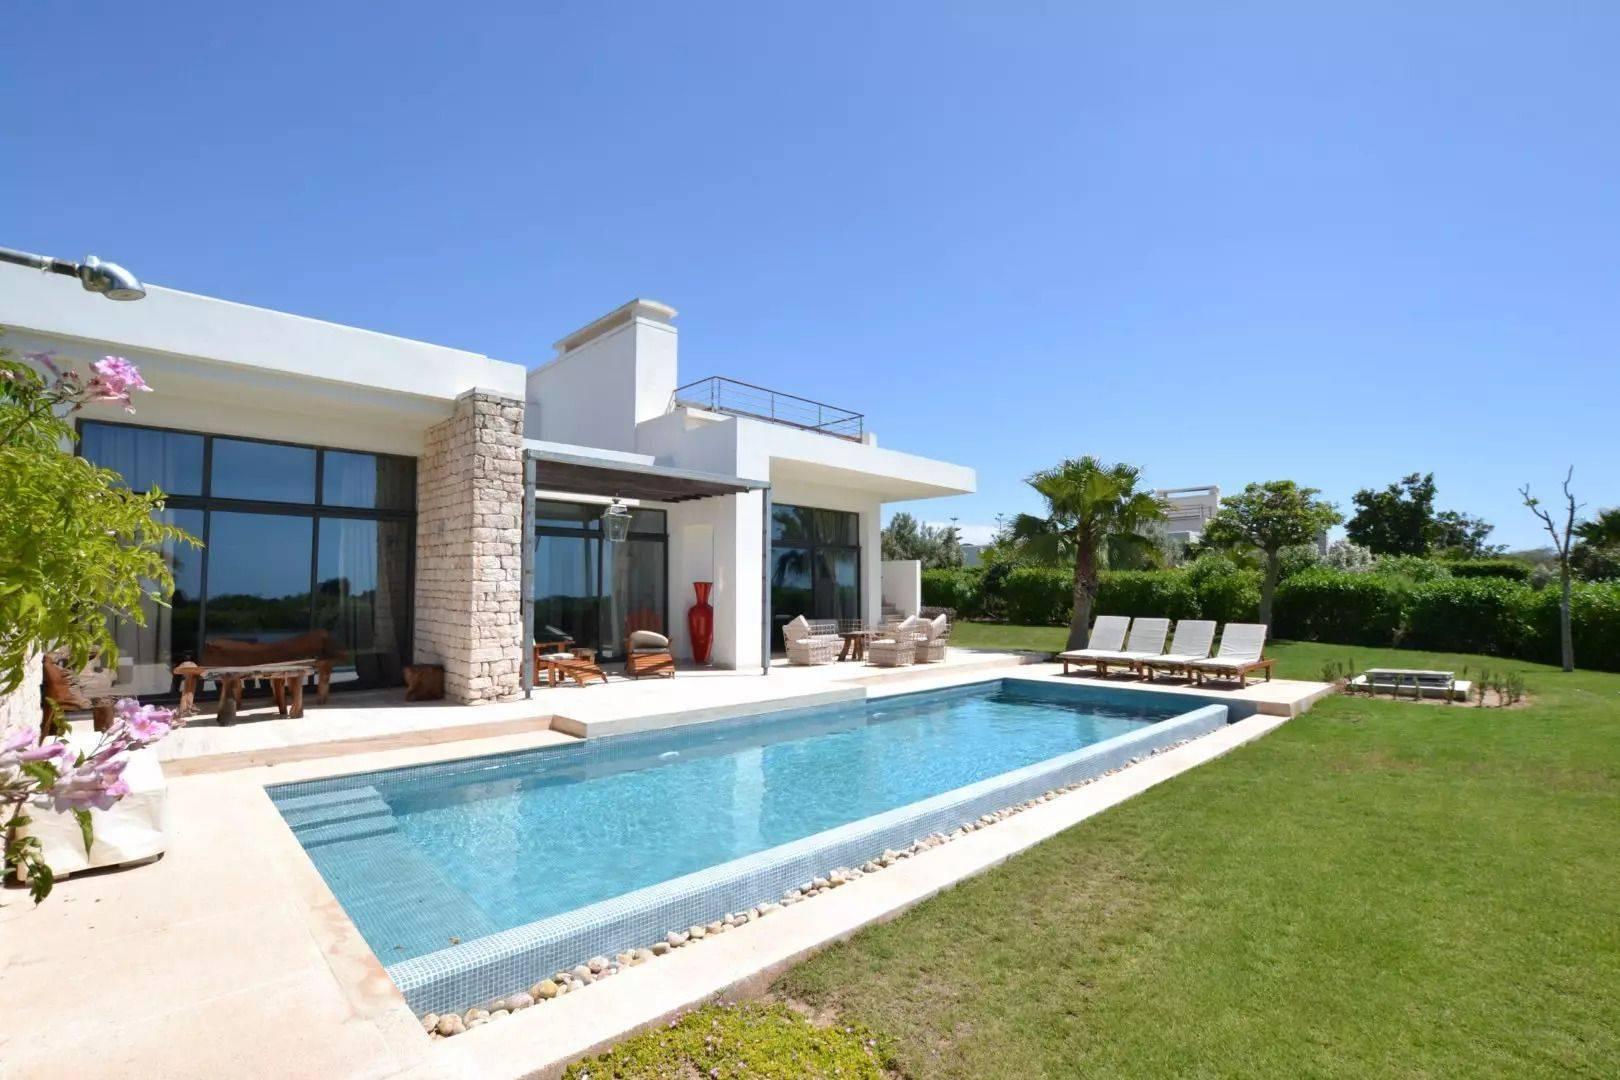 location villa piscine chauffée essaouira (5).jpg